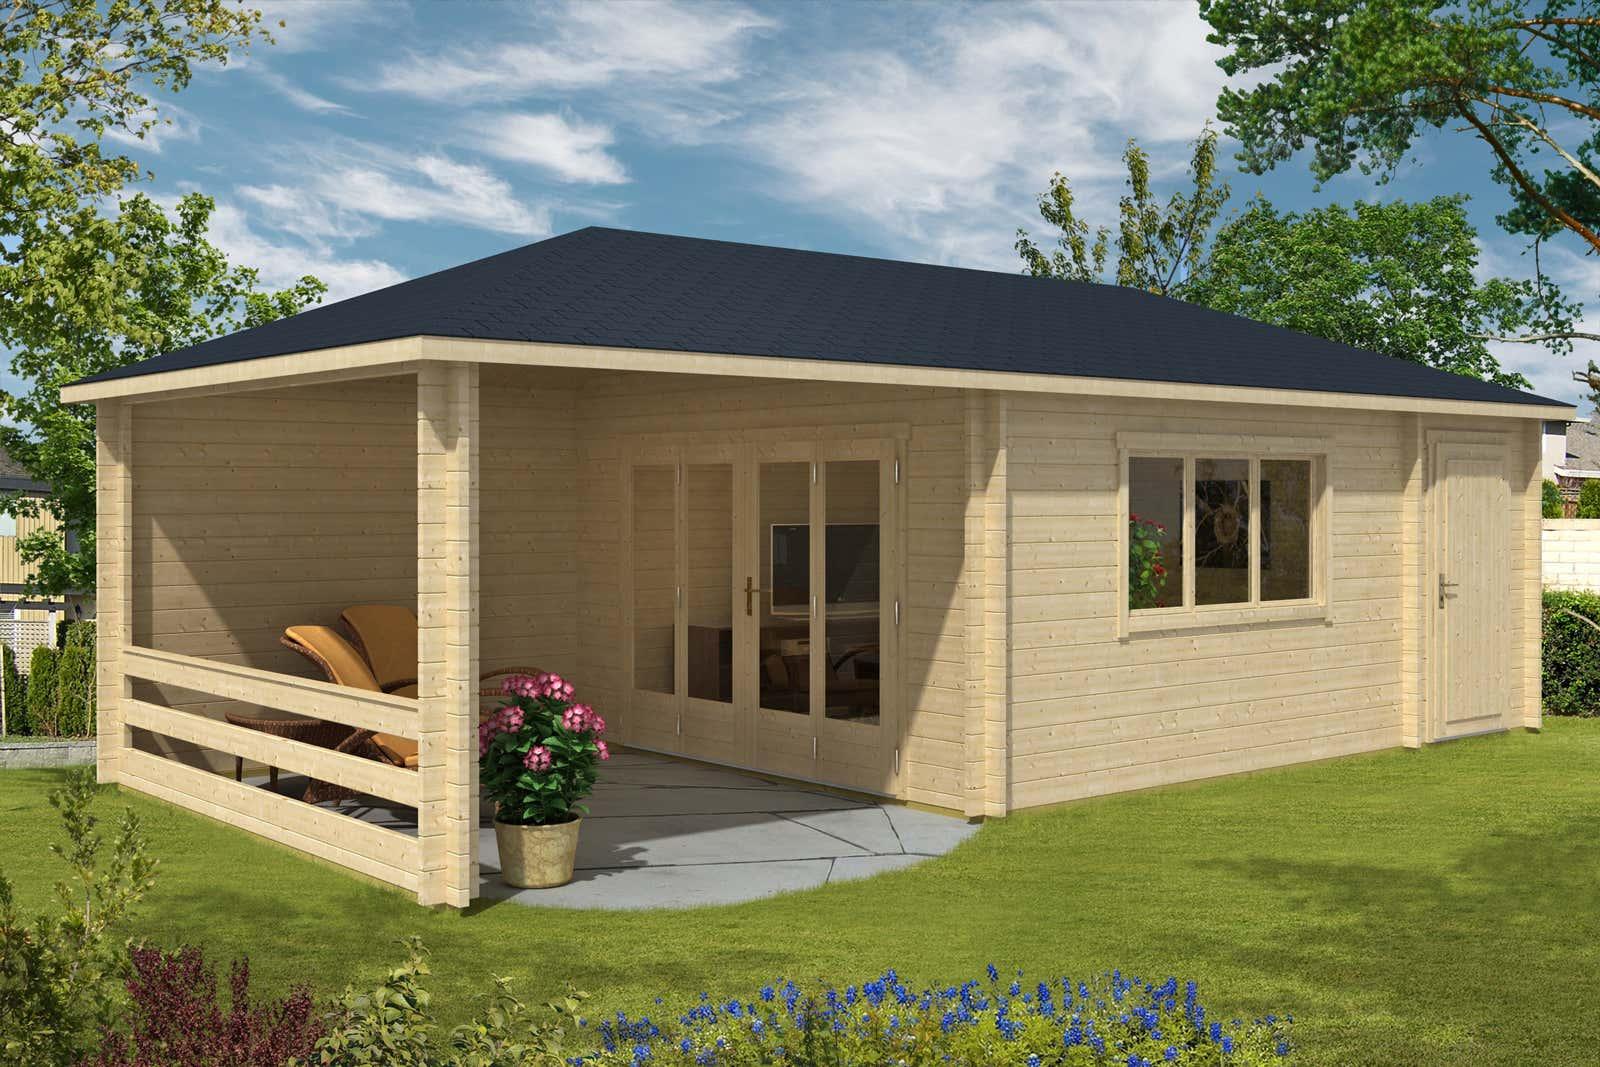 gartenhaus modell montana 44 mit anbau a z gartenhaus gmbh. Black Bedroom Furniture Sets. Home Design Ideas